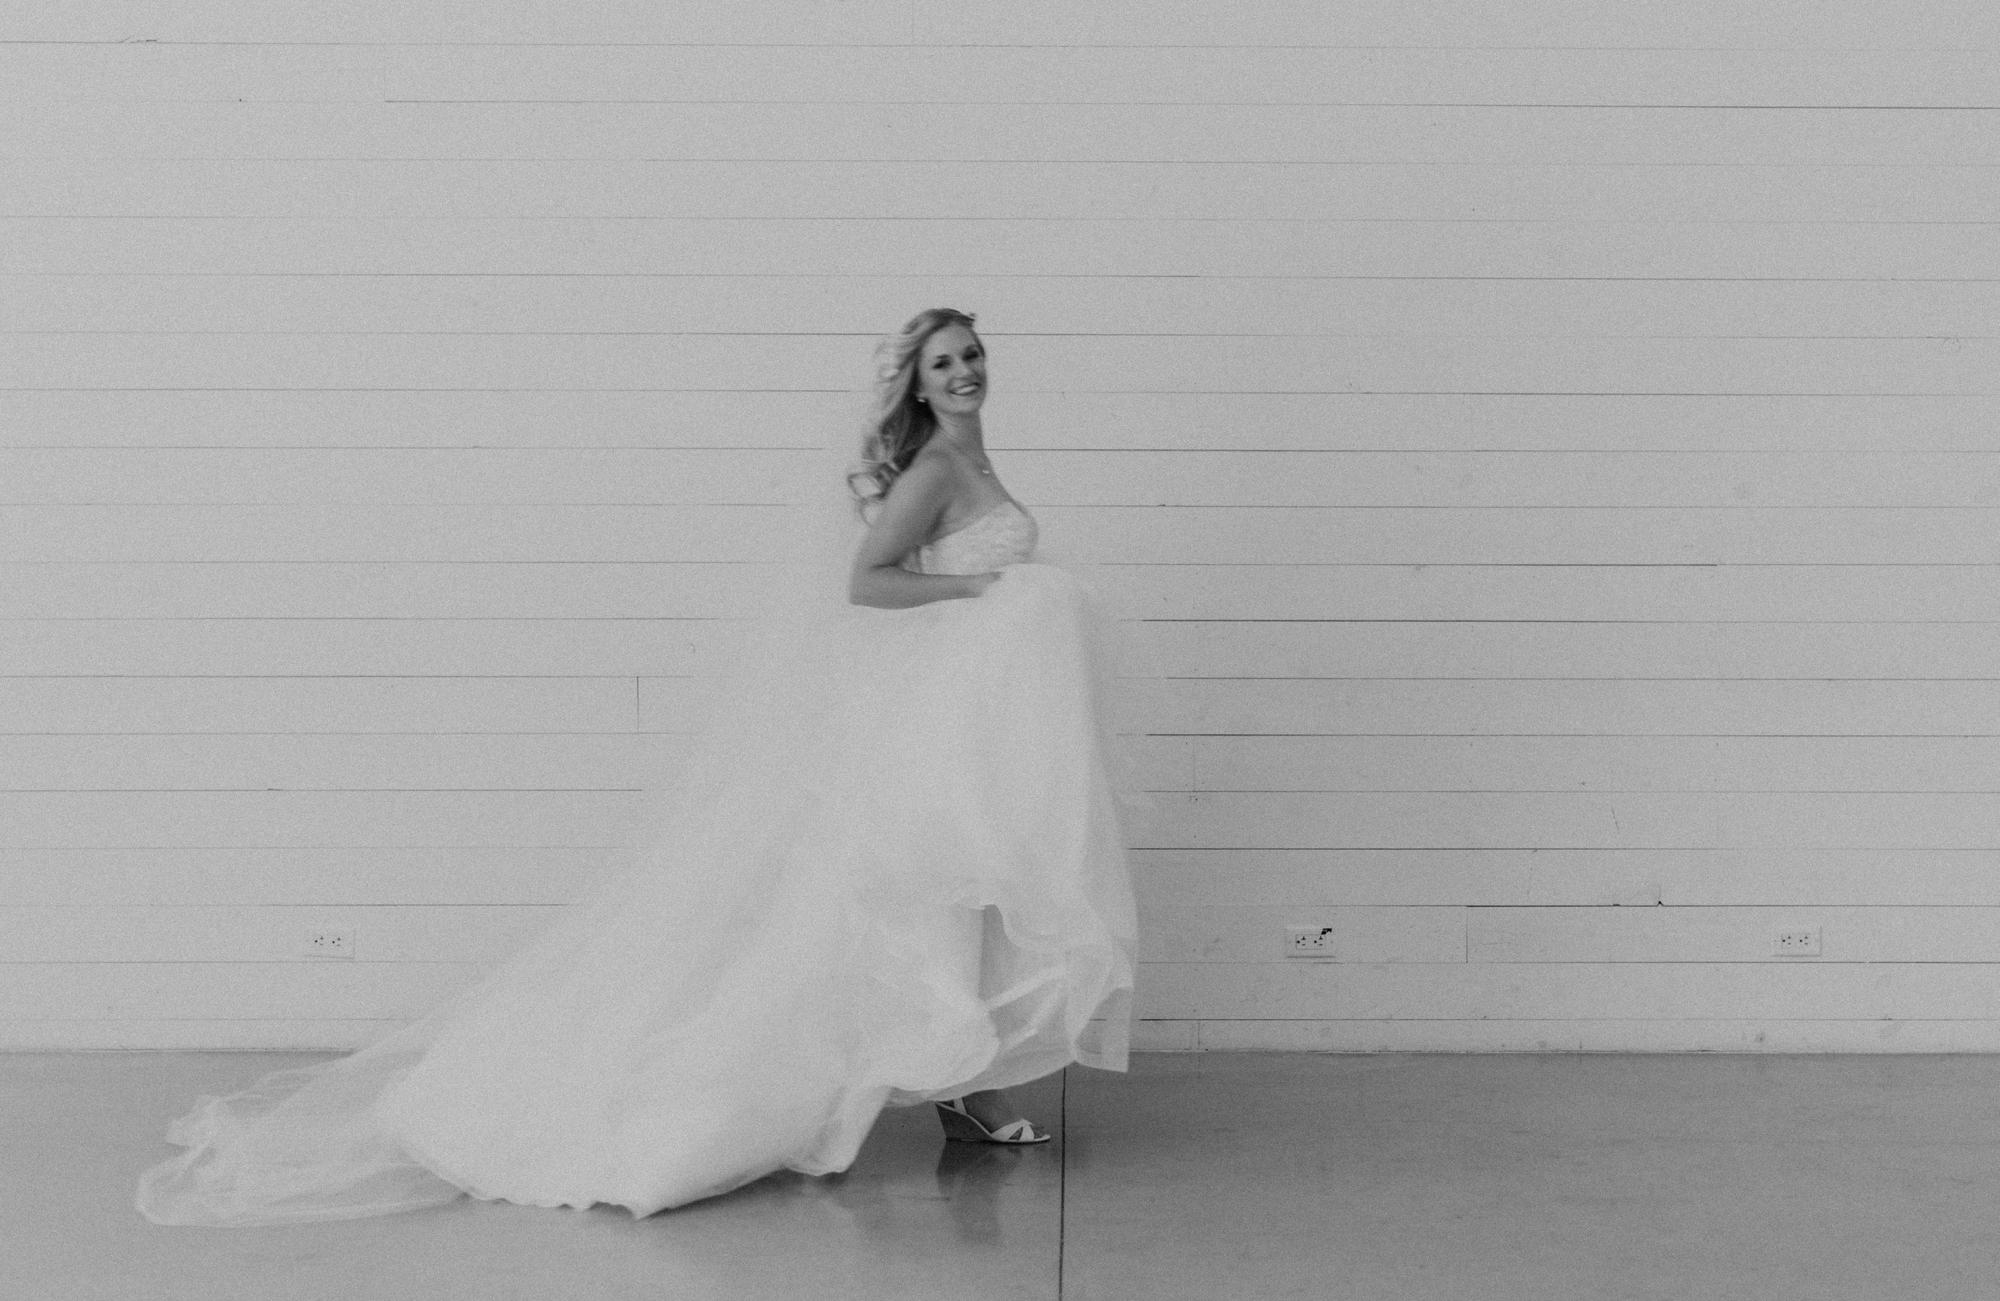 austin-texas-prospect-house-wedding-photography-1778-photographie-56.jpg